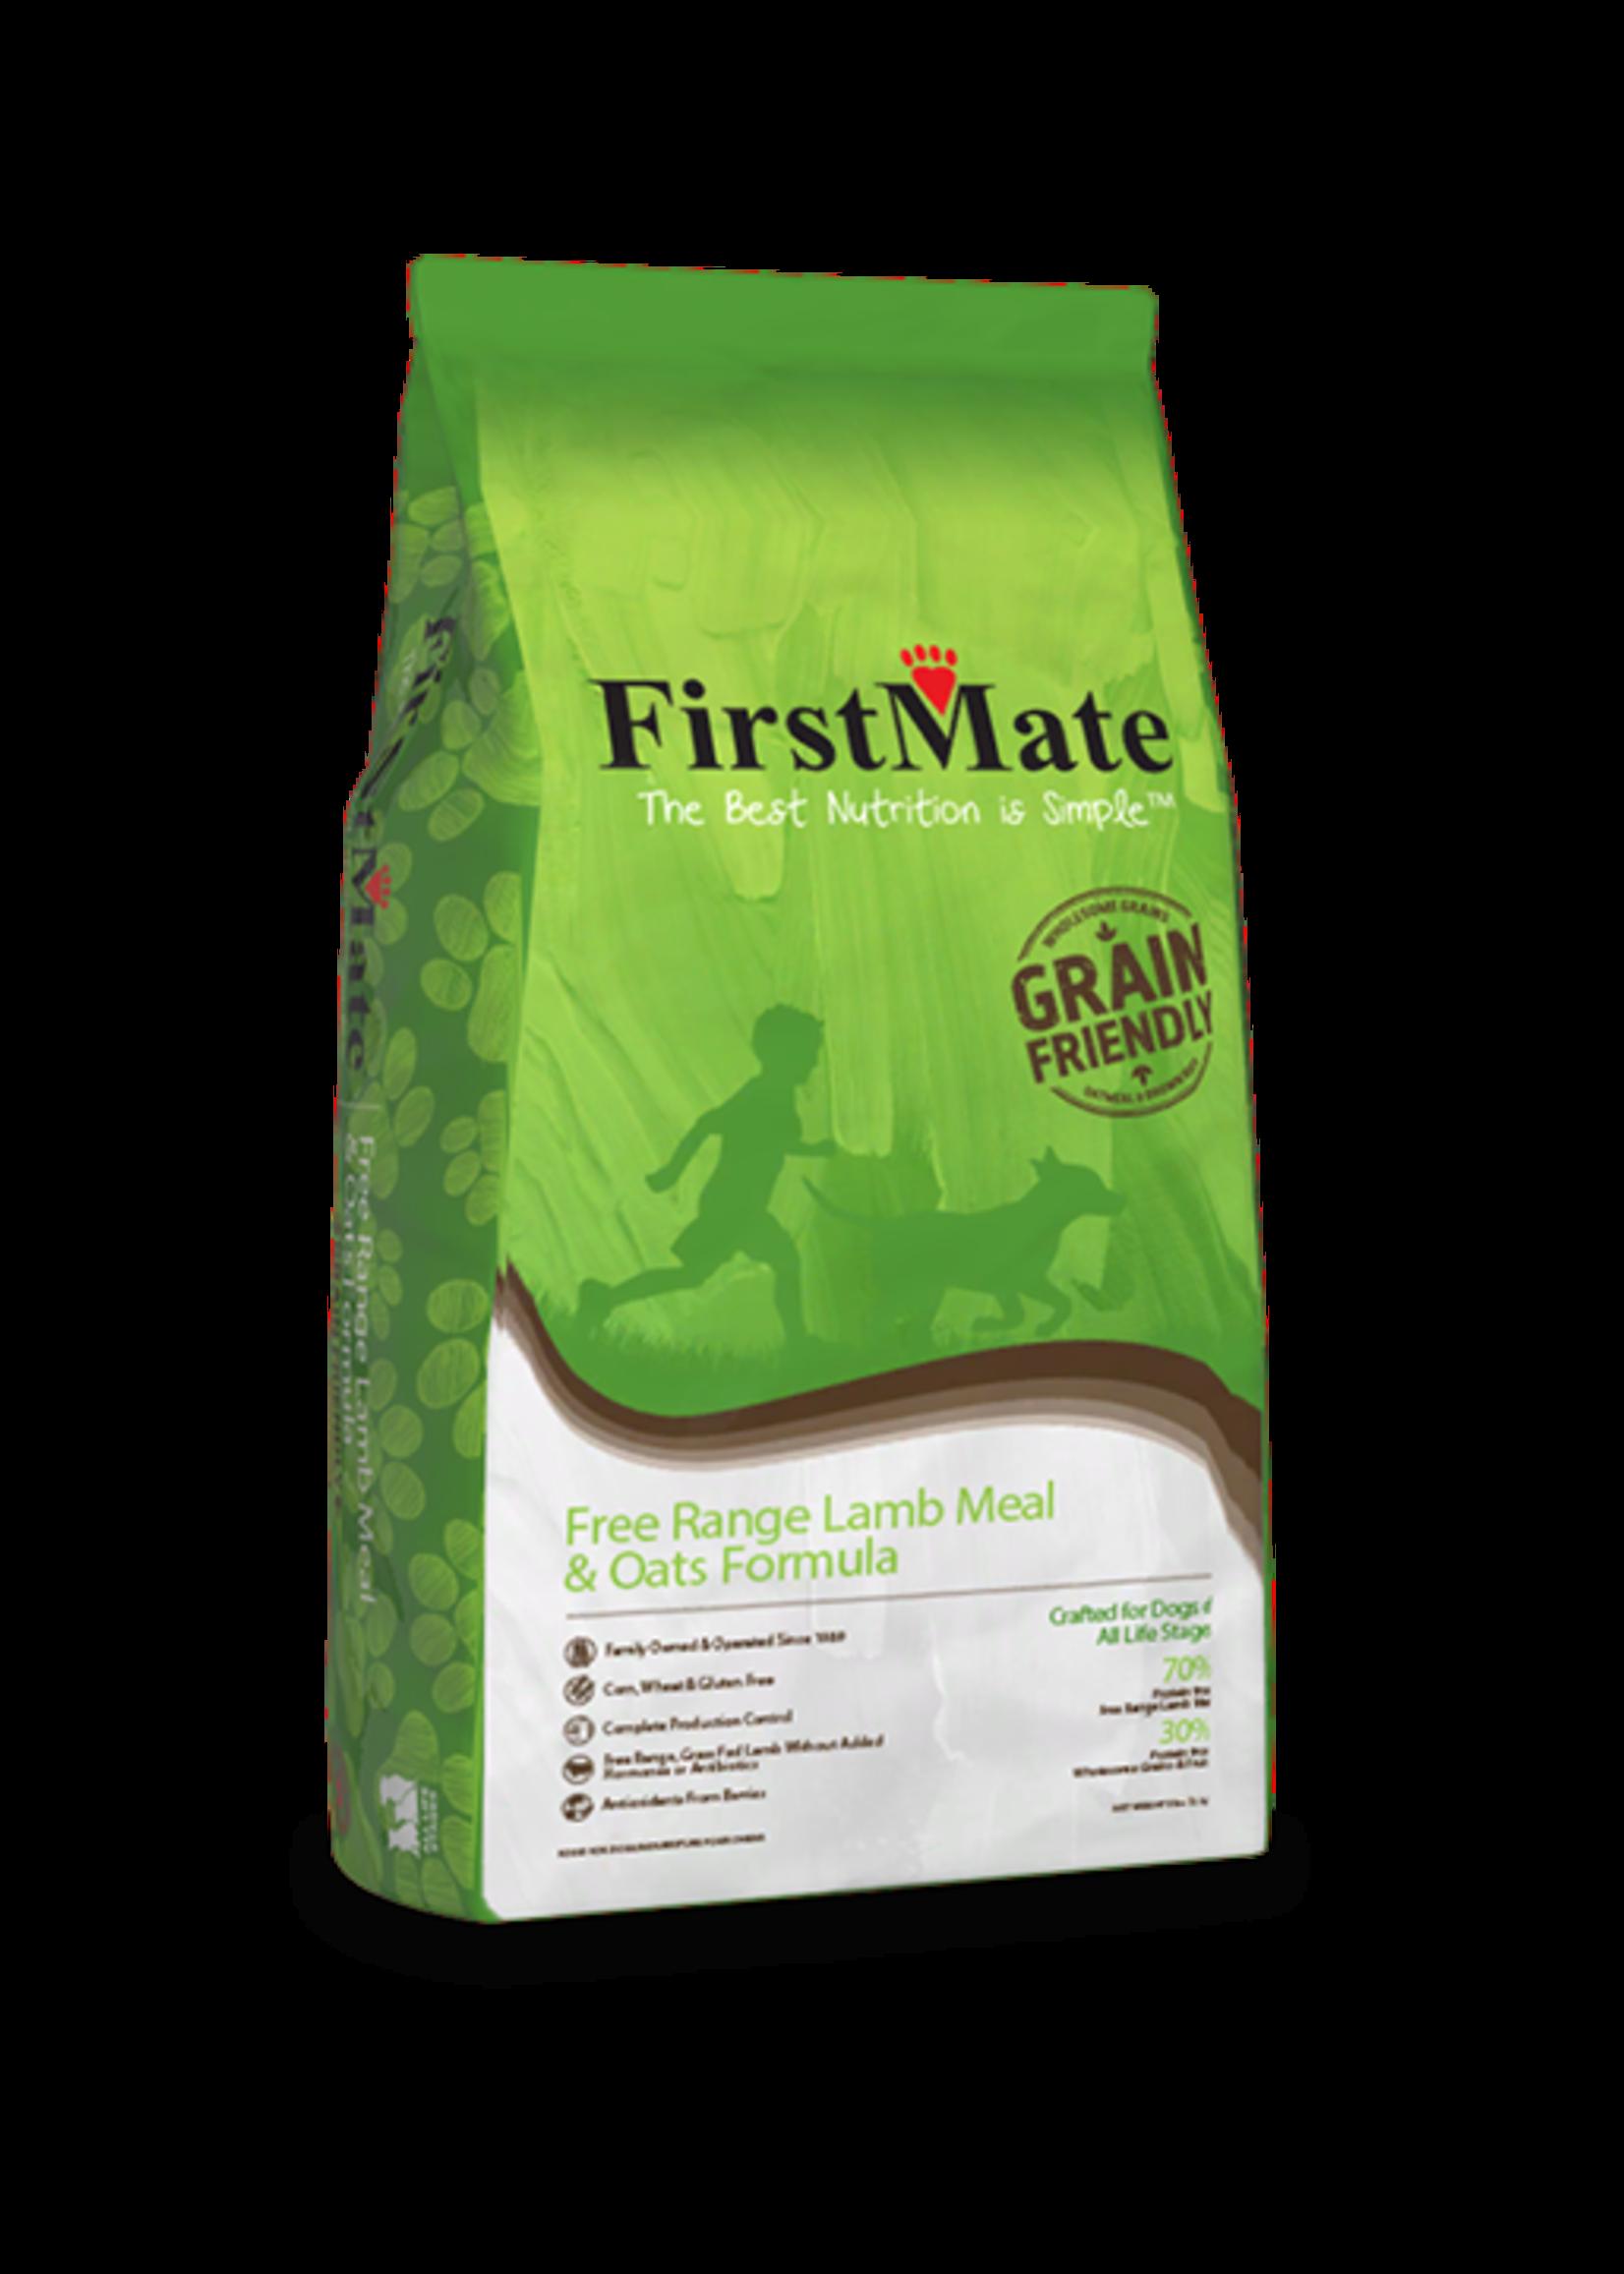 FirstMate FirstMate Free Range Lamb Meal & Oats Formula 25lbs